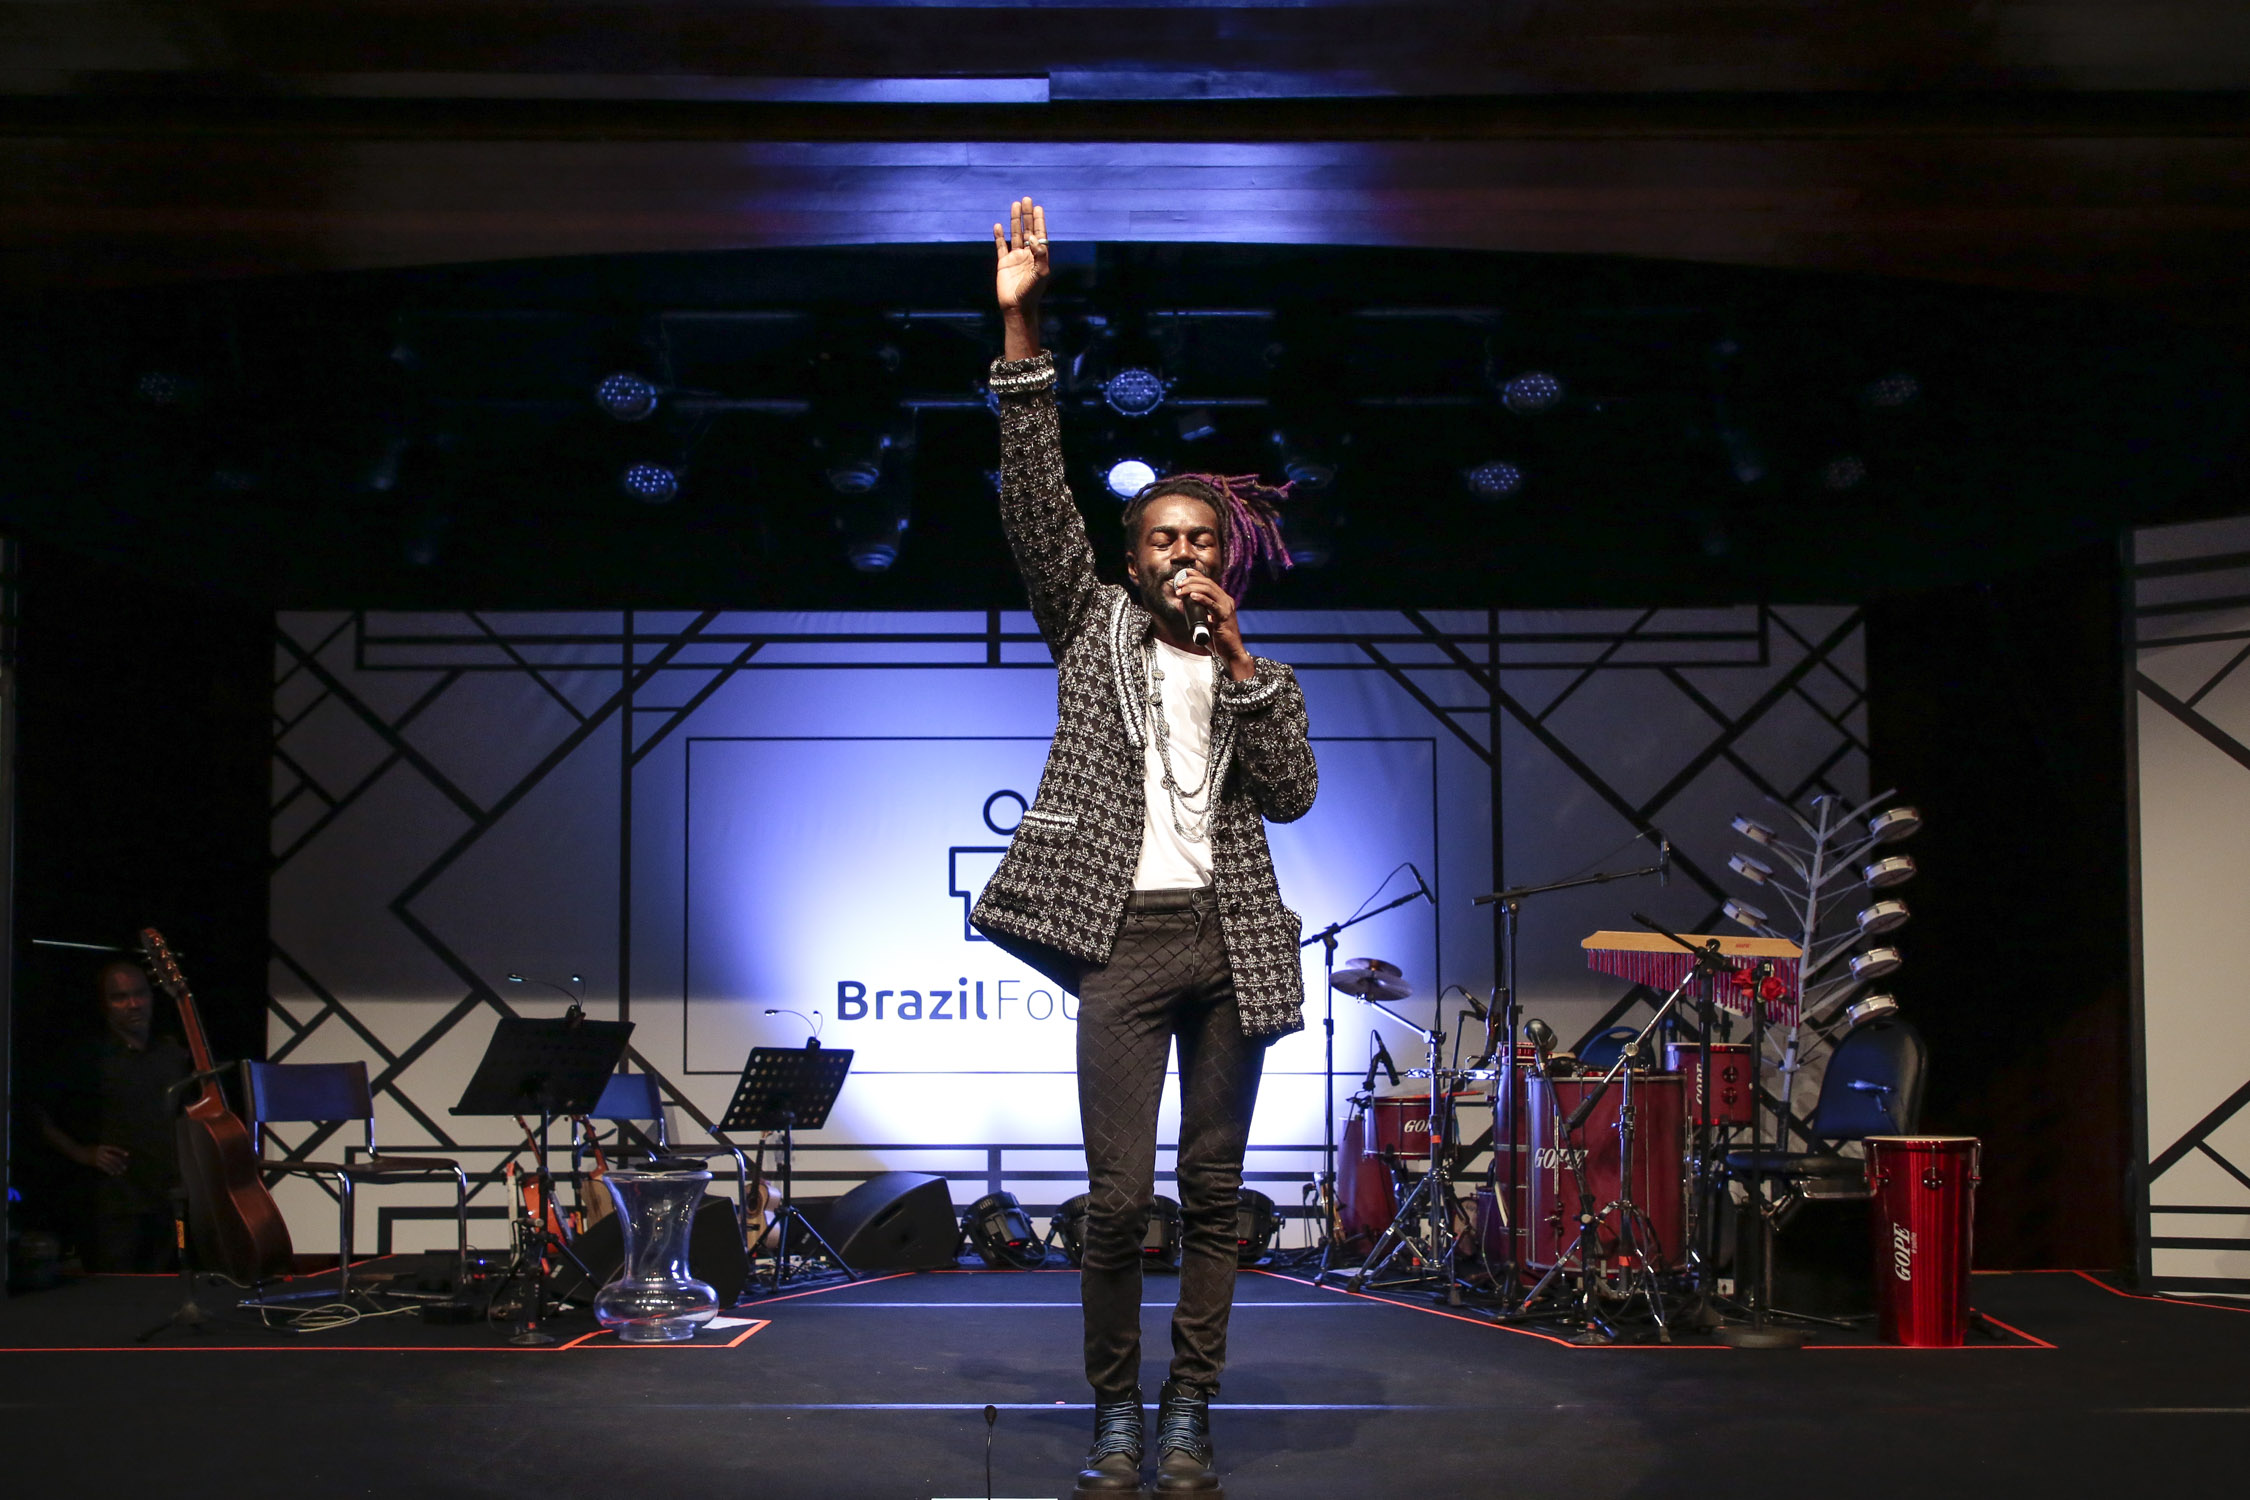 Jonathan Azevedo V BrazilFoundation Gala São Paulo Chanel 2018 Filantropia Brasil Philanthropy Brazil